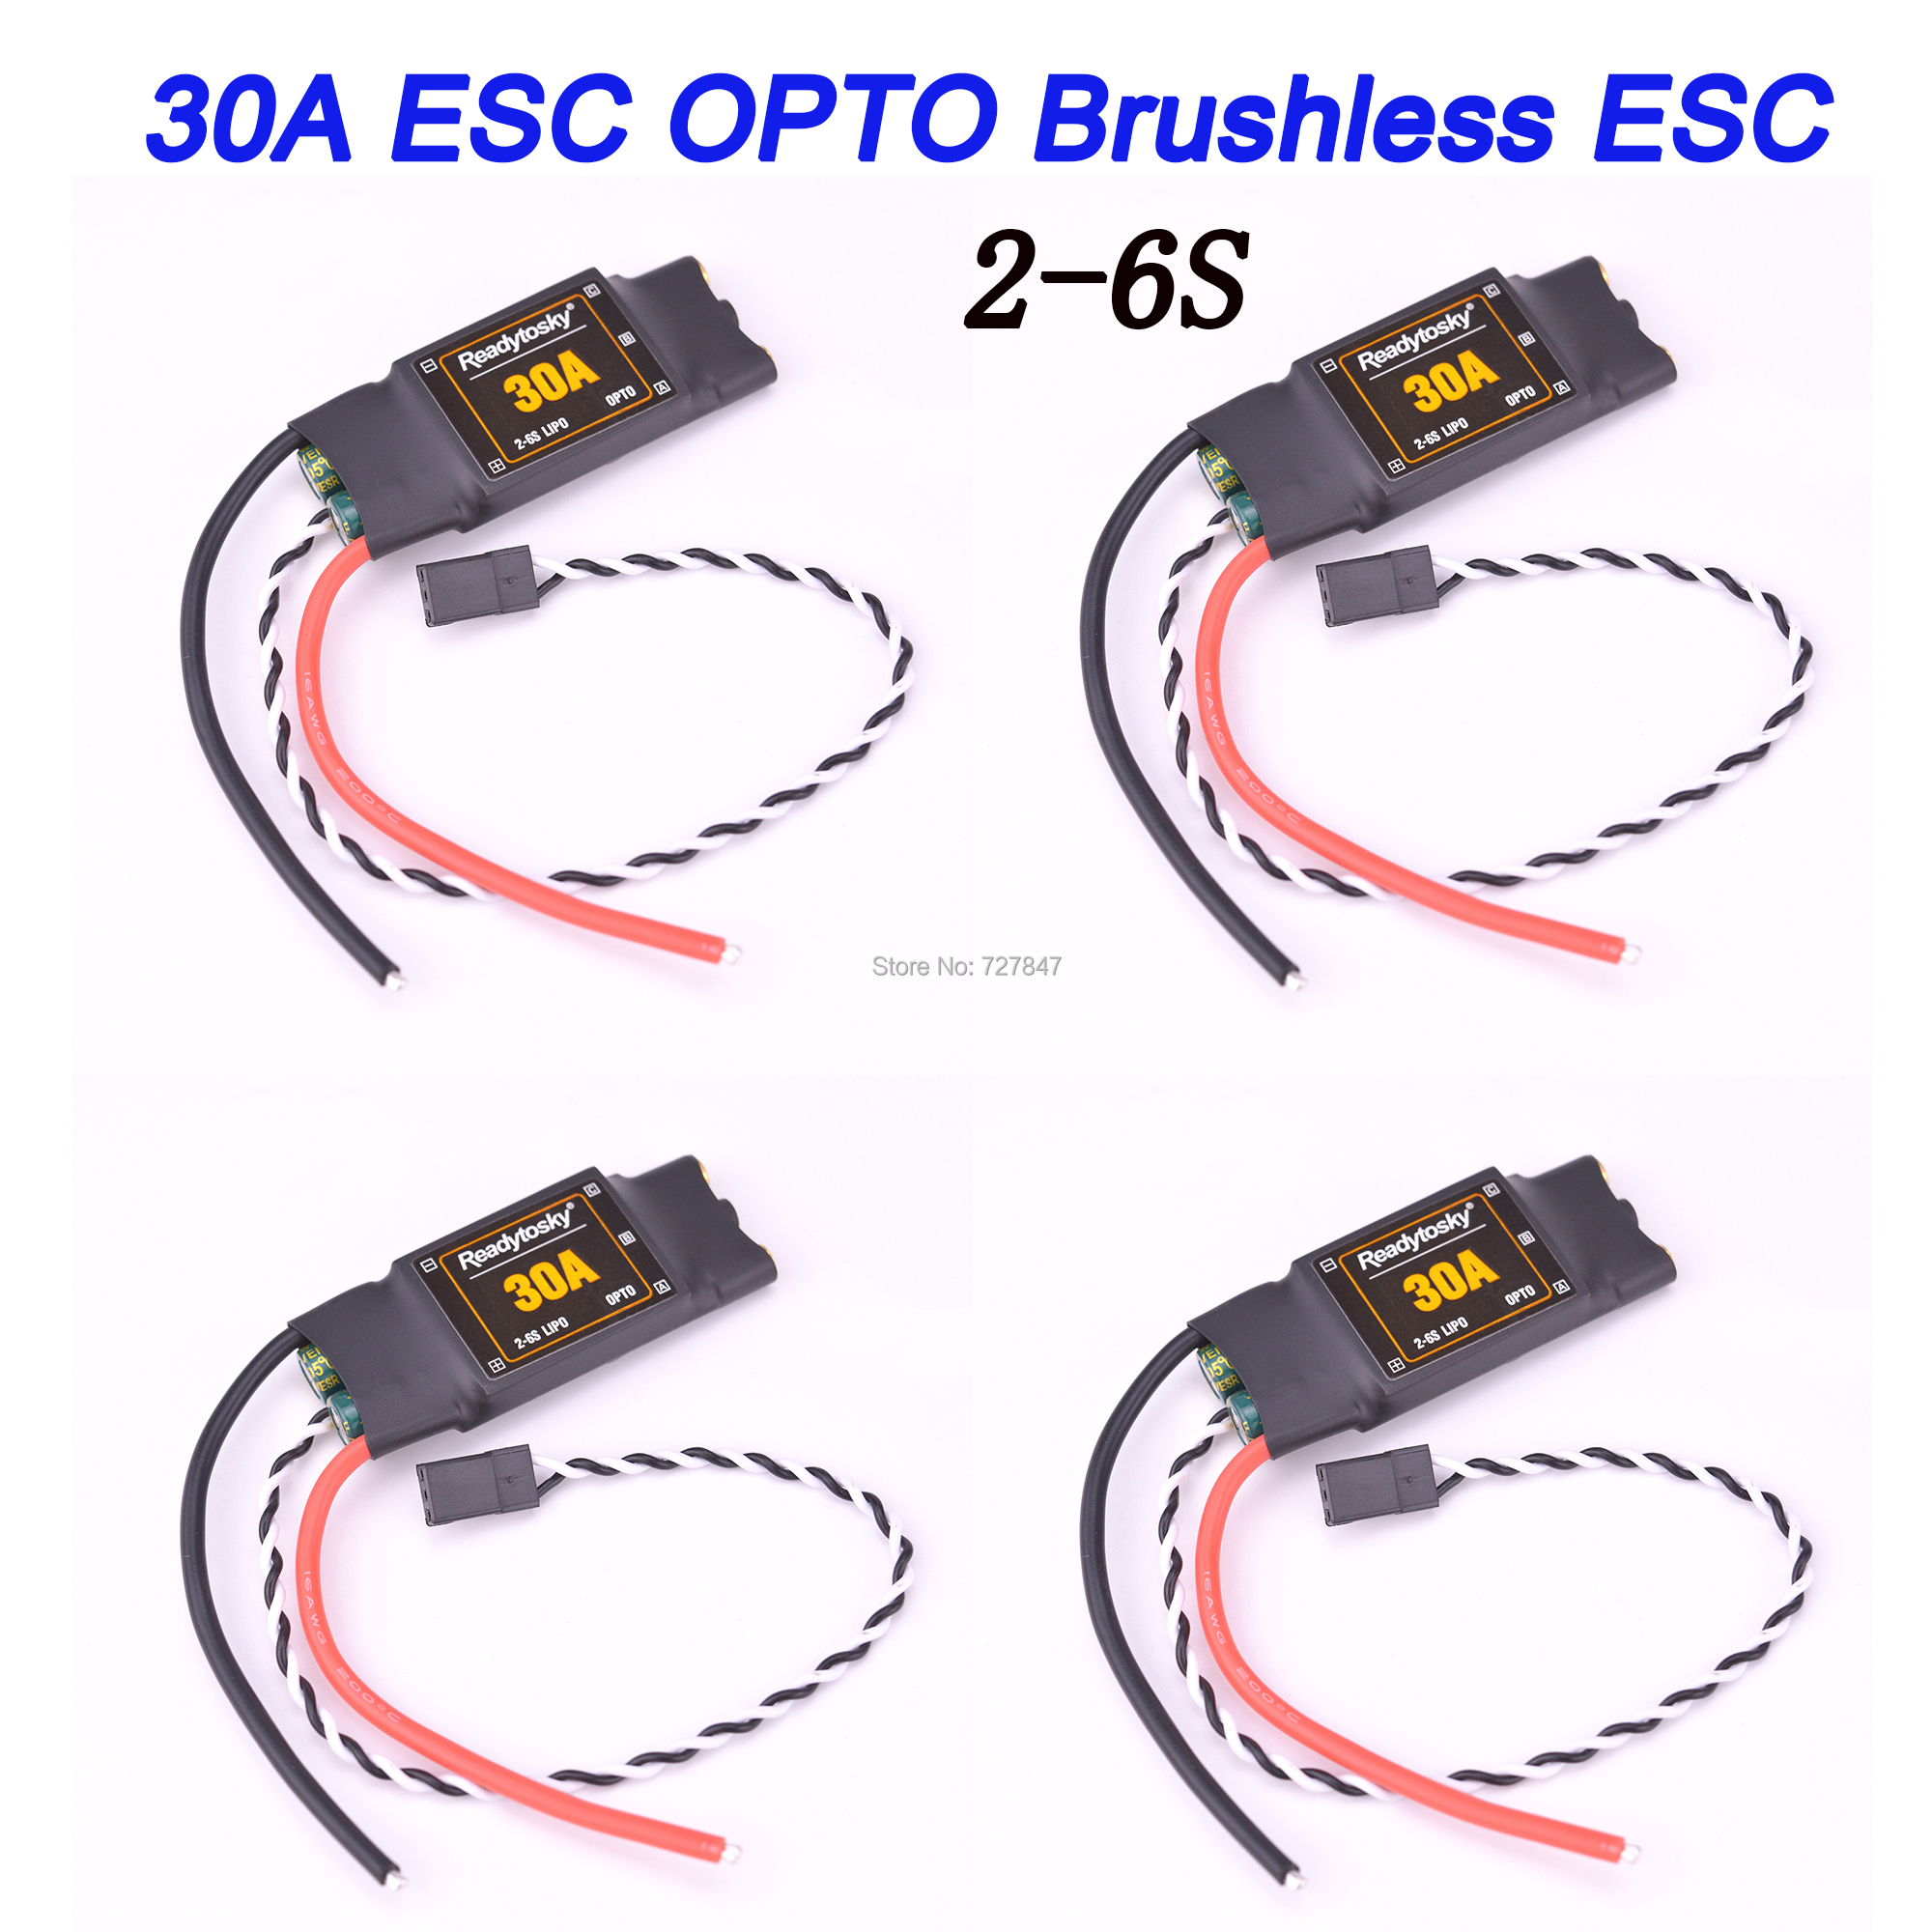 NOVA 30A 2-6 S Brushless ESC OPTO ESC Controlador Eletrônico de Velocidade Para F450 S500 ZD550 RC Helicóptero Quadcopter